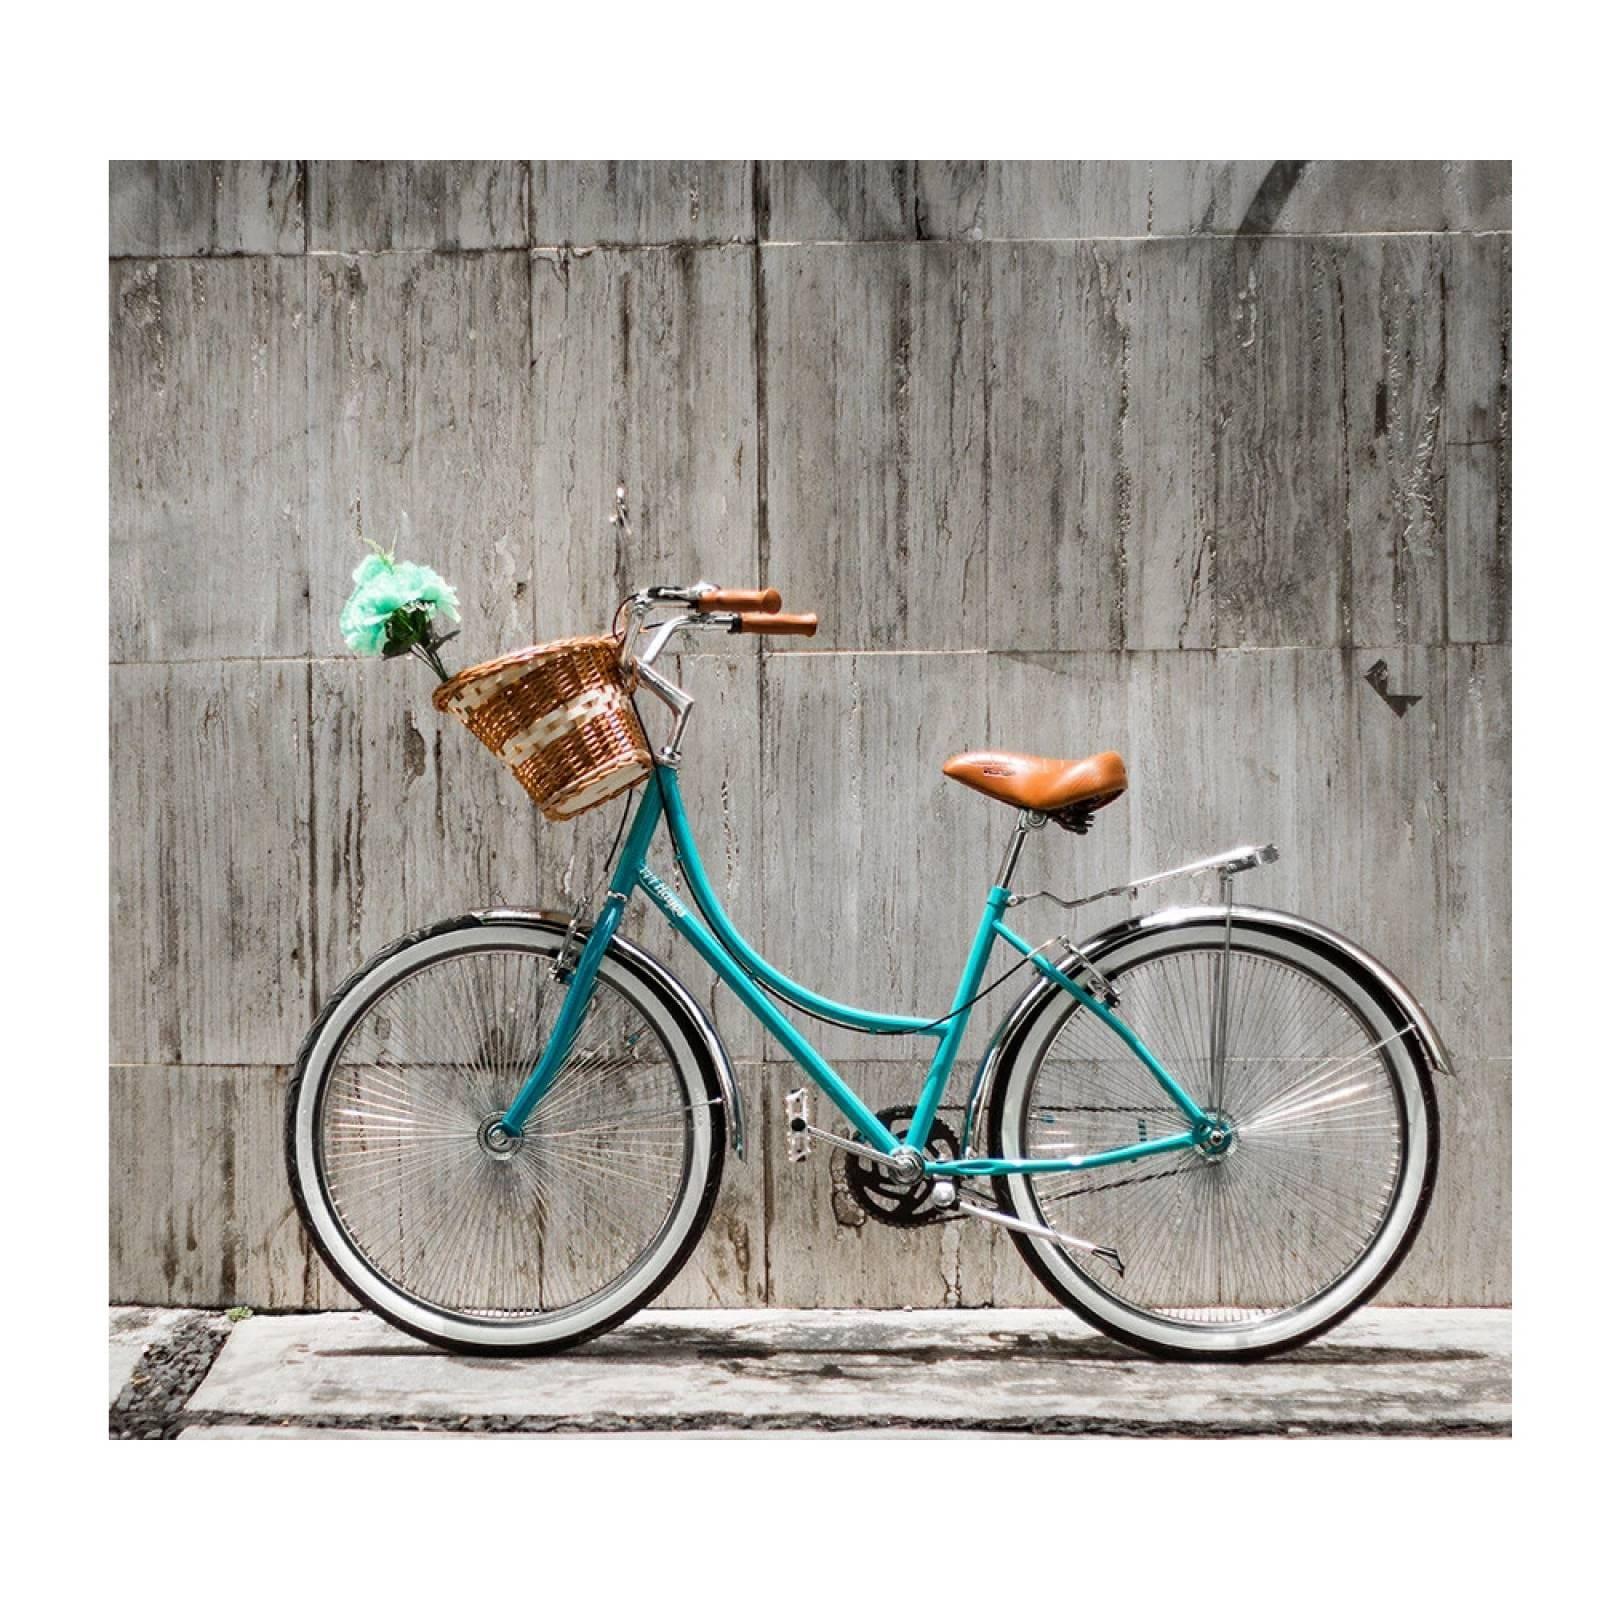 Bici Inglesa144 R-26 Portabultos Salpicadera Reflejantes 3M 144 Rayos Bikes